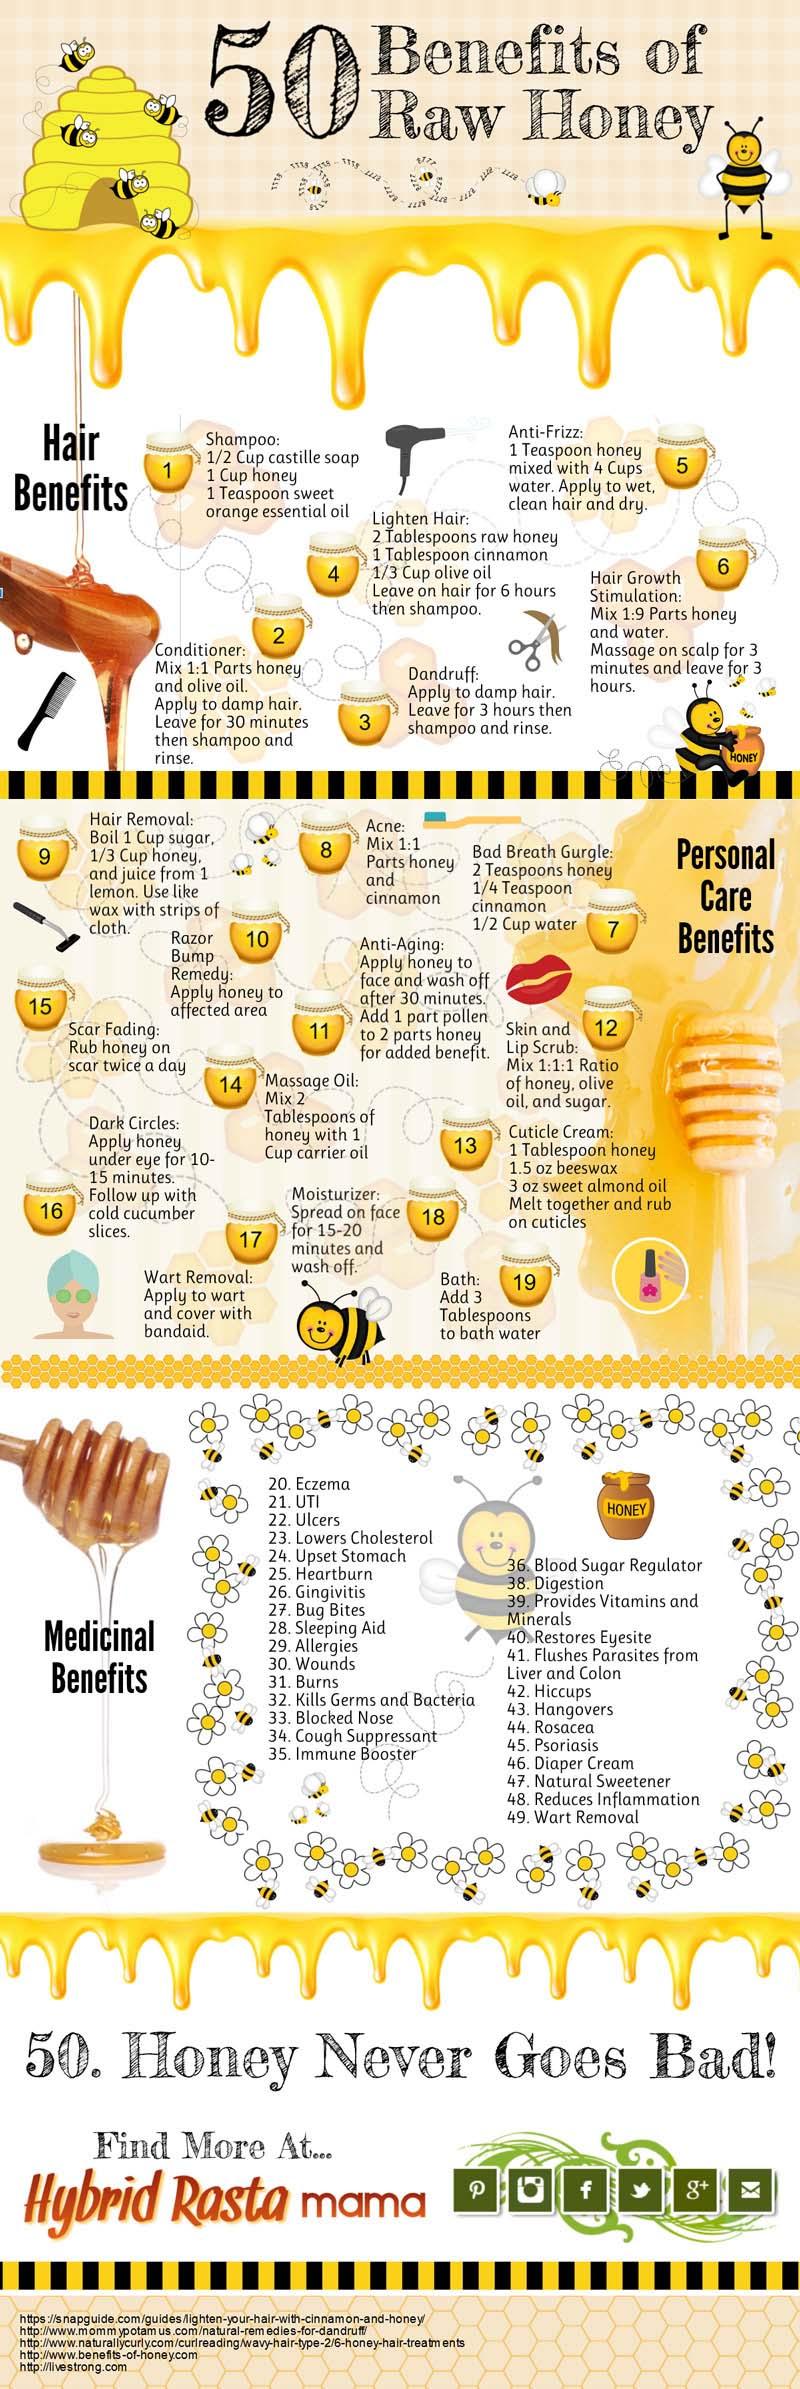 50 Amazing Benefits Of Raw Honey Infographic